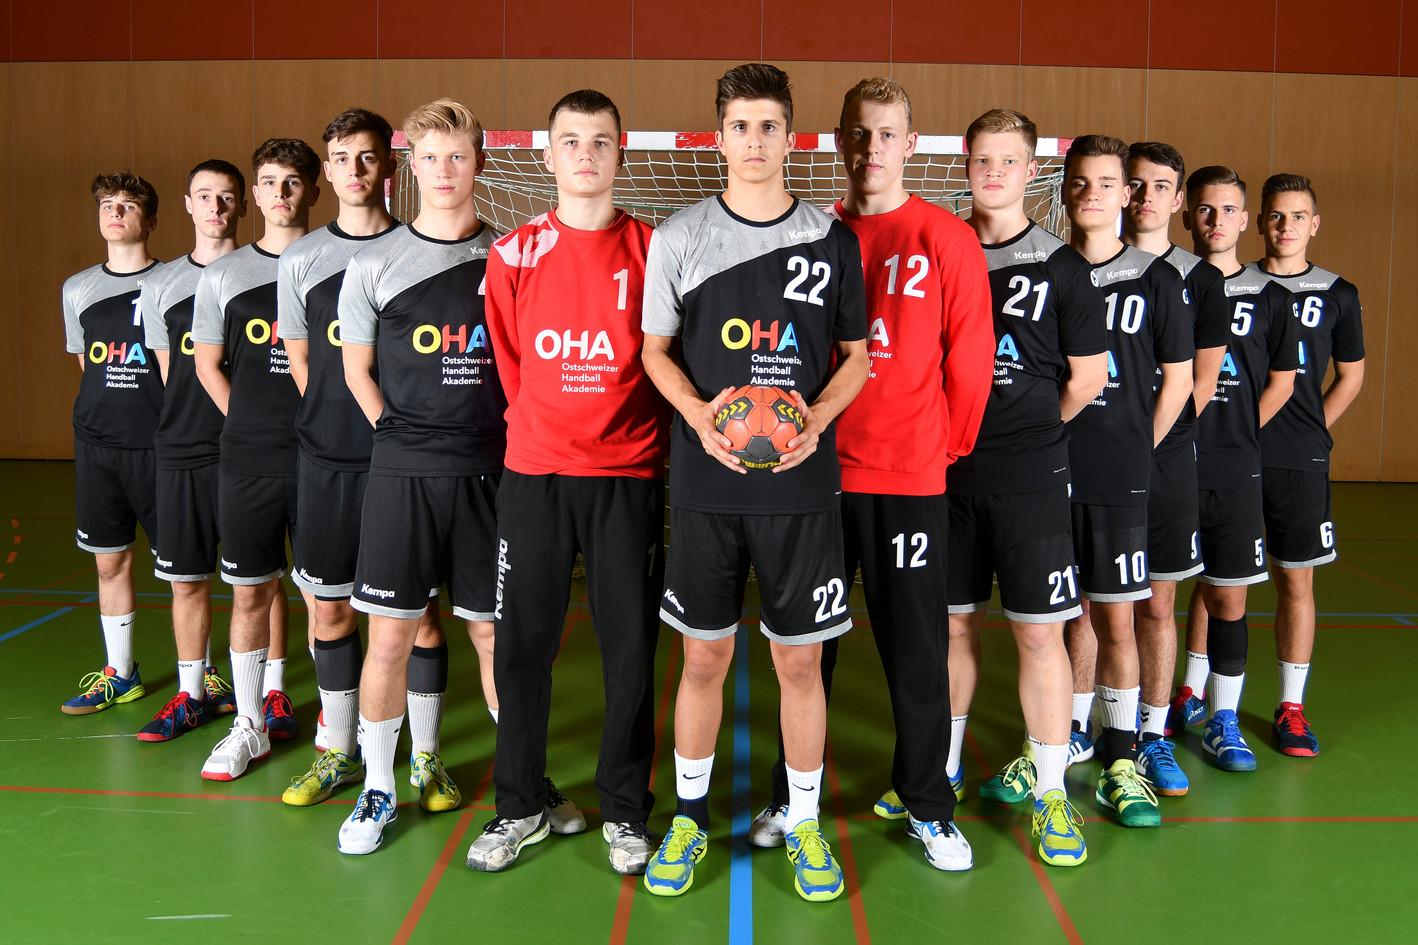 2018_OHA_Mannschaftsbilder_hires_004.jpg